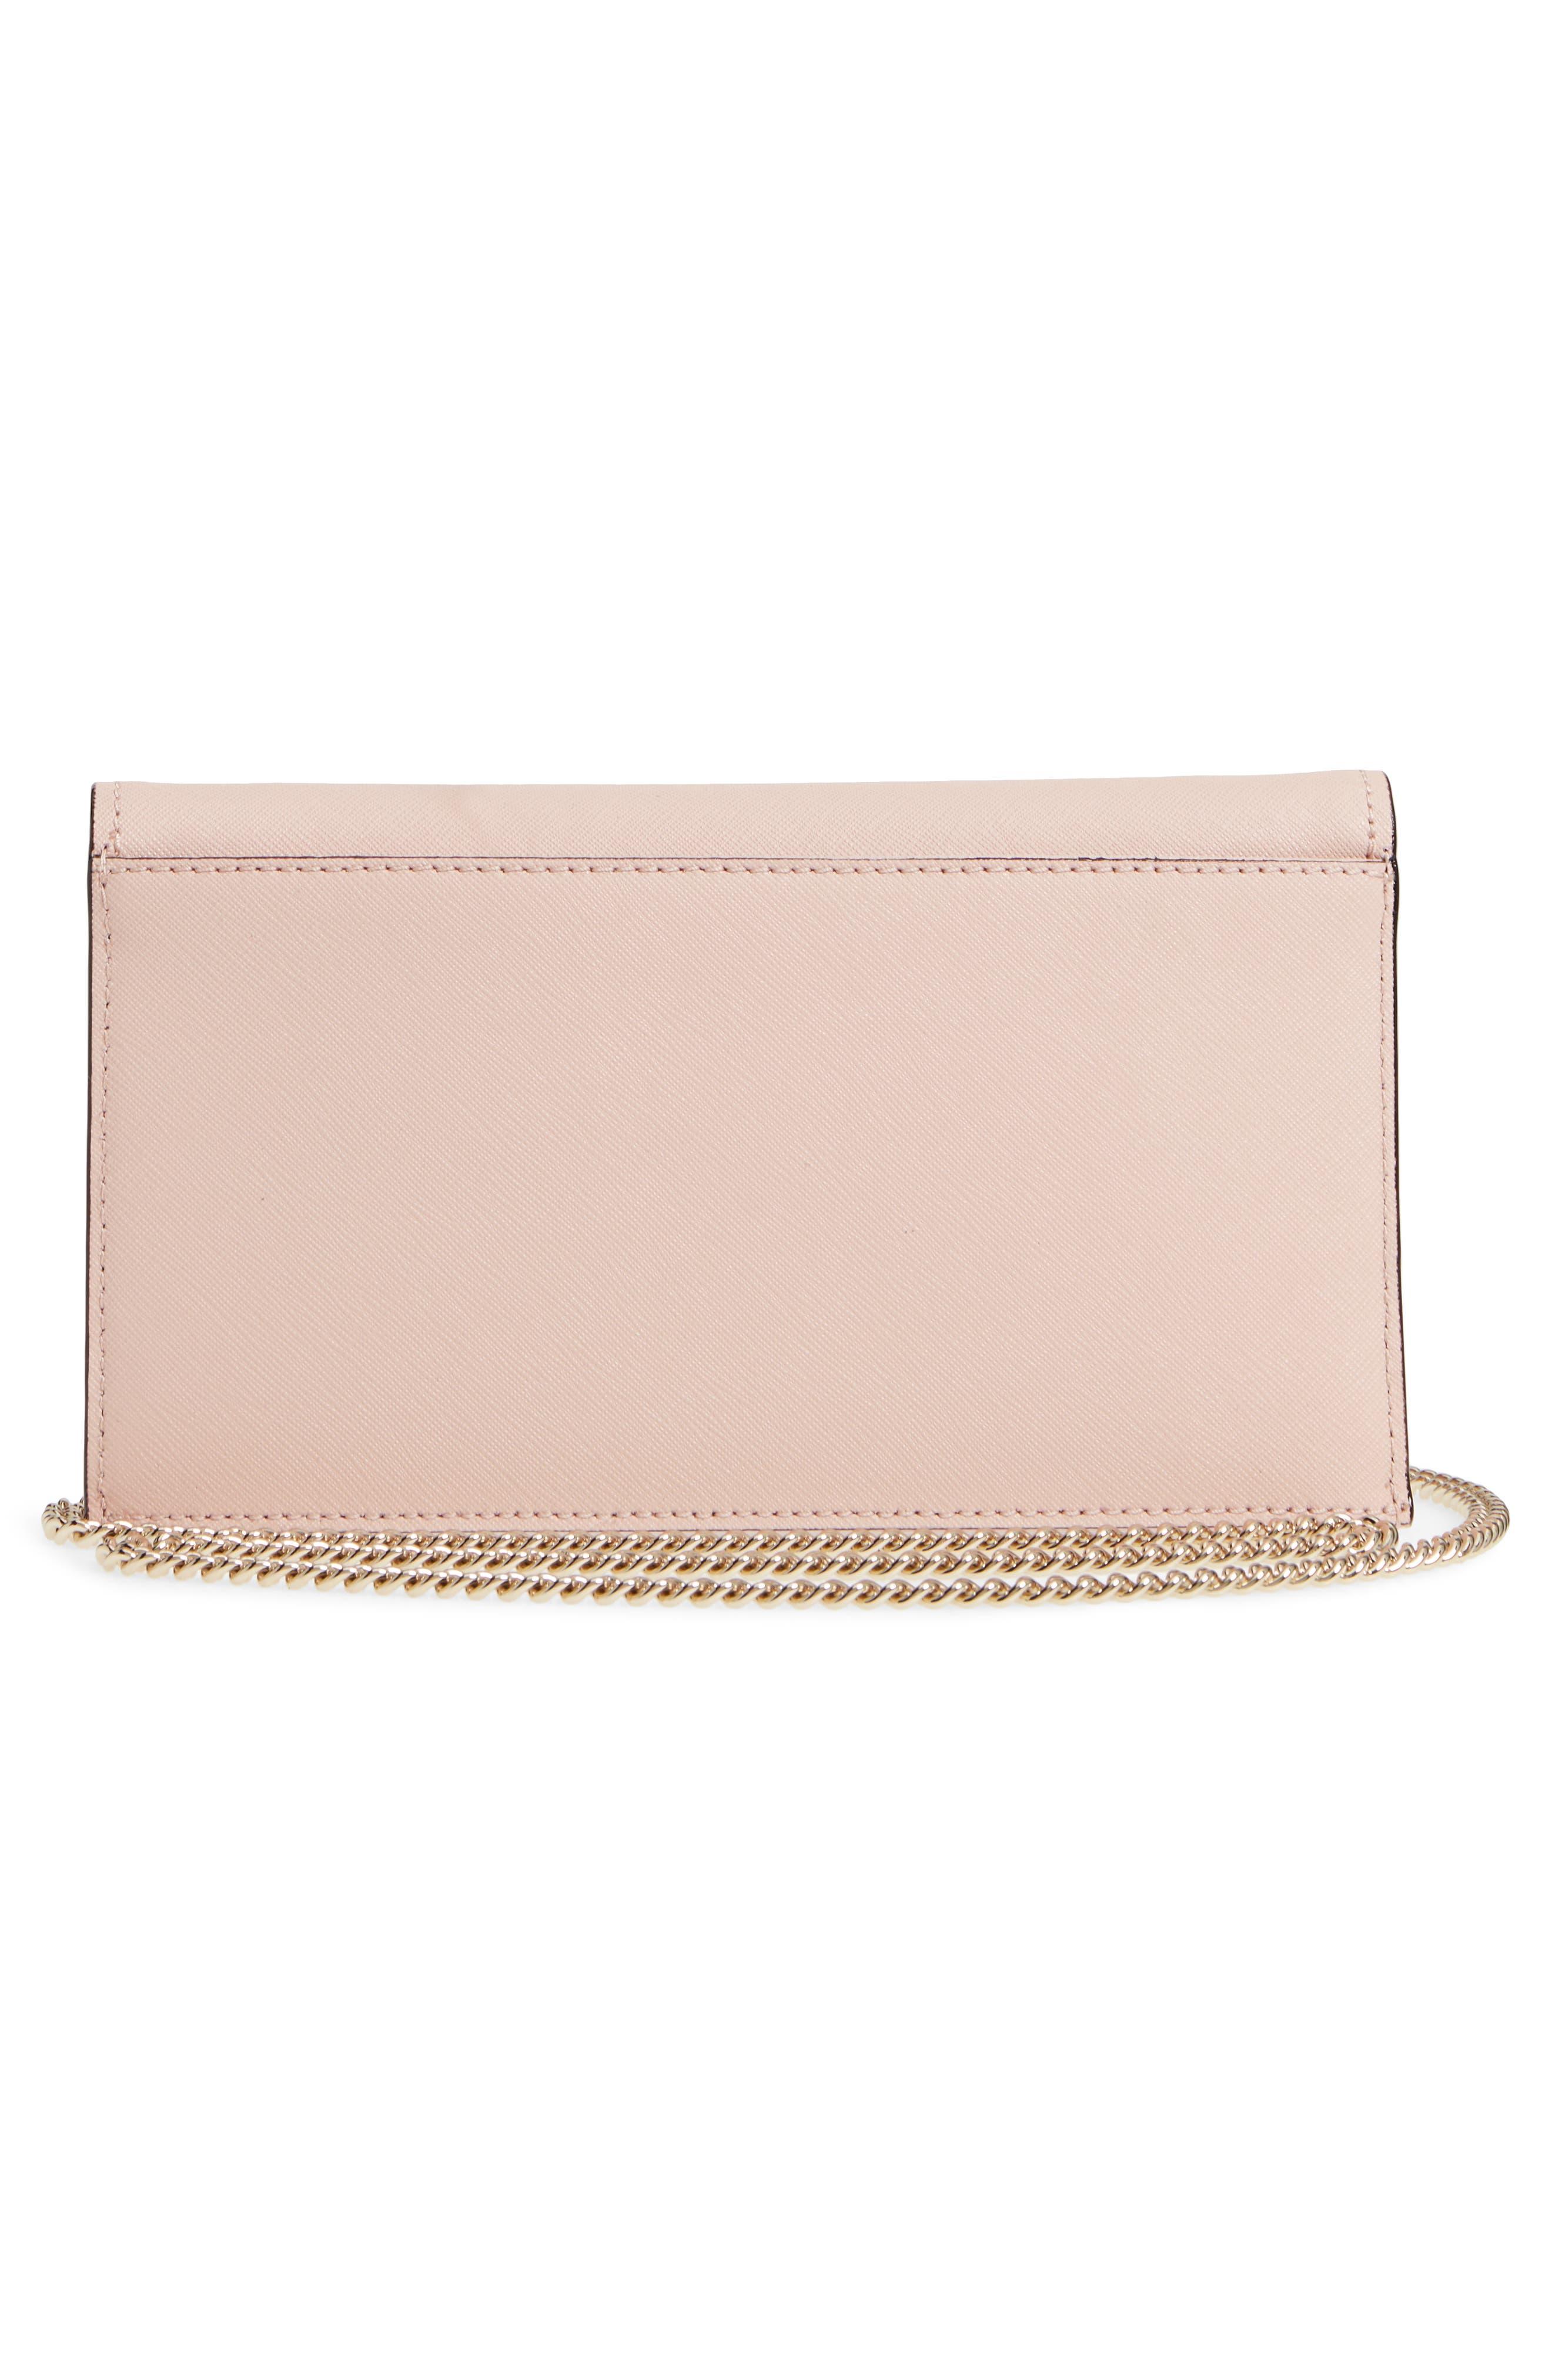 cameron street - brennan leather wallet & card case,                             Alternate thumbnail 3, color,                             Warm Vellum